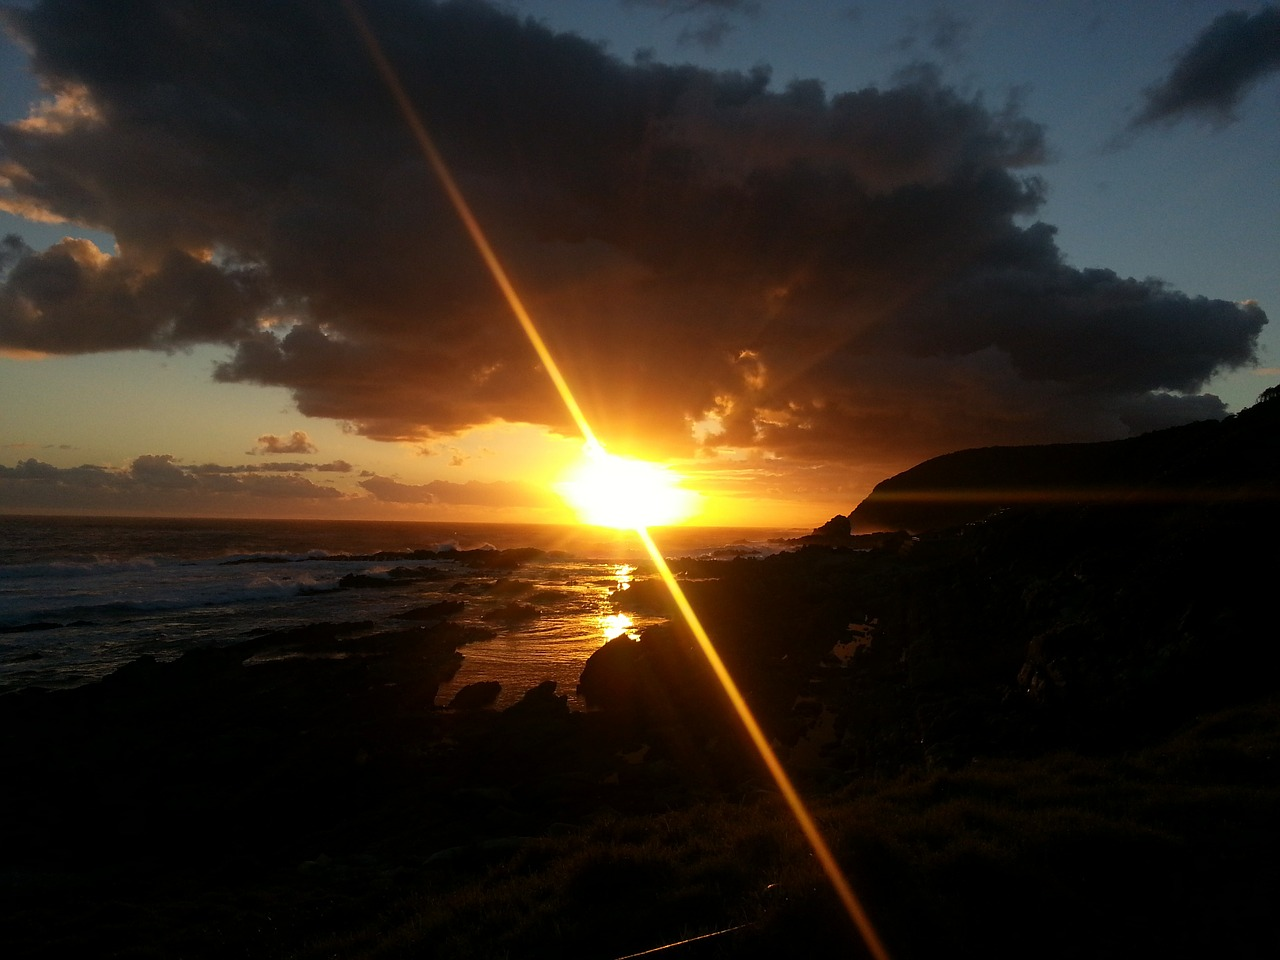 sunset-354516_1280